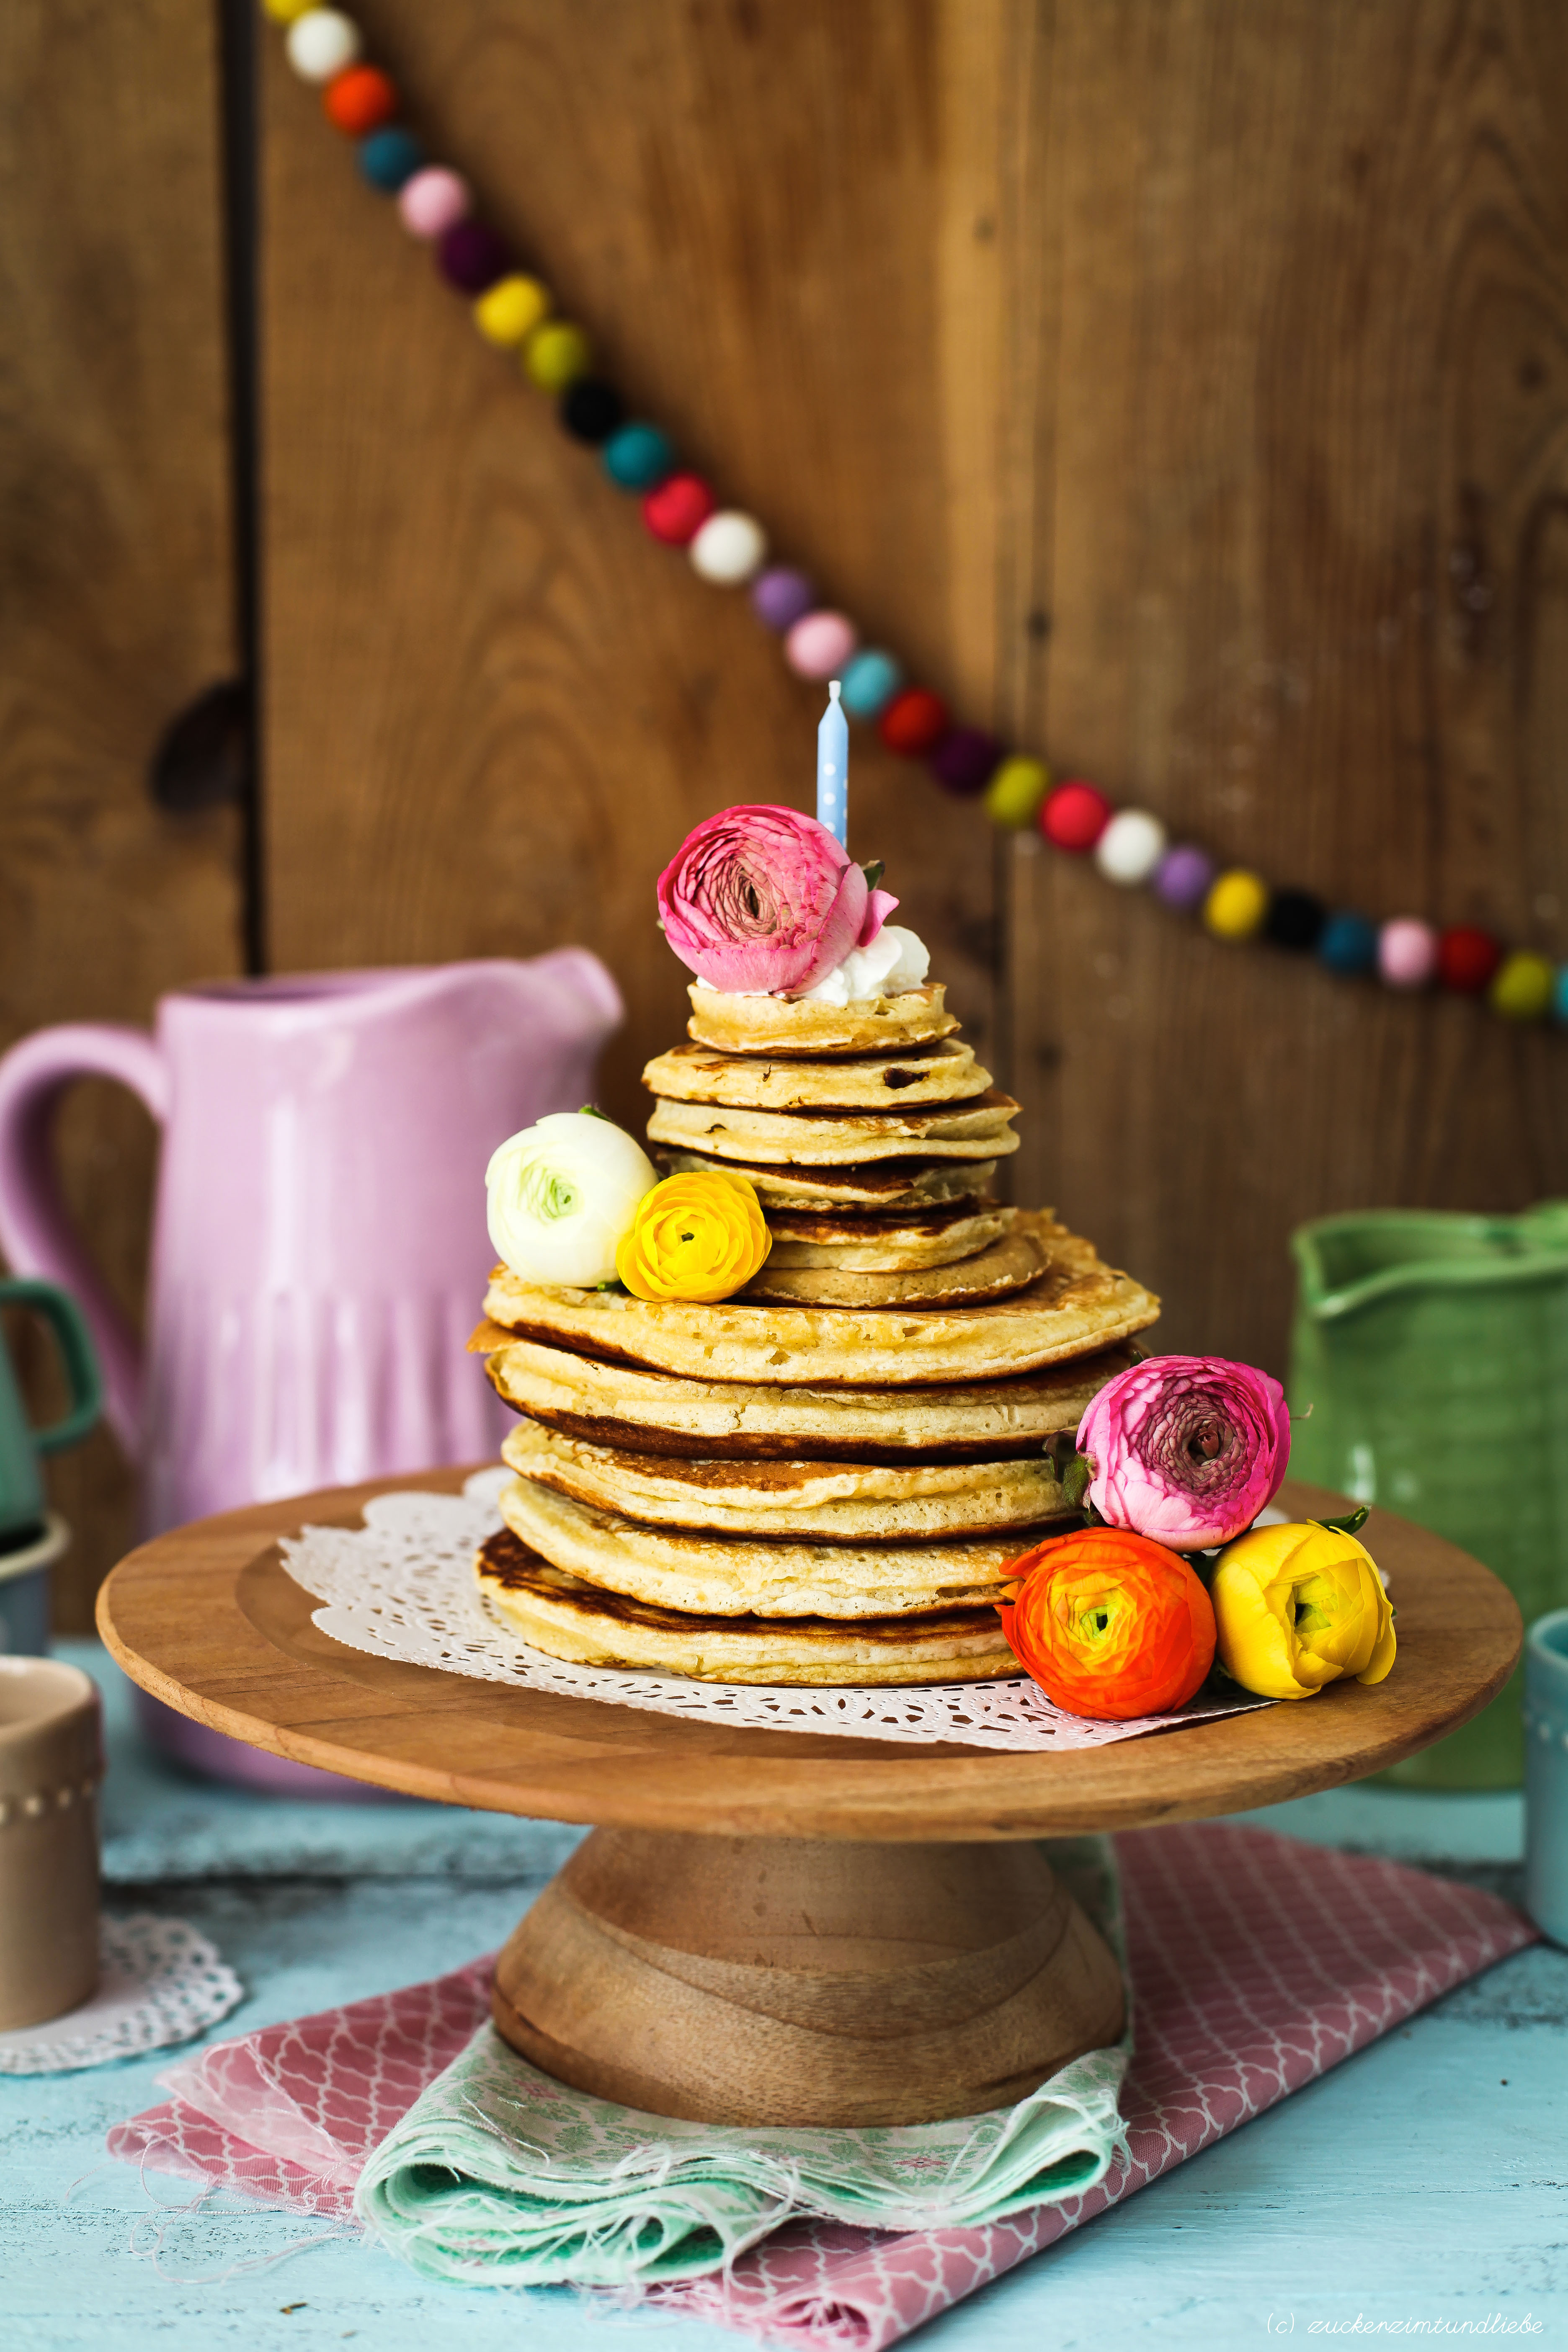 Zuckerzimtundliebe Rezept Zitronen Buttermilch Pancakes Geburtstagstorte Lecker Weltrekord-5b